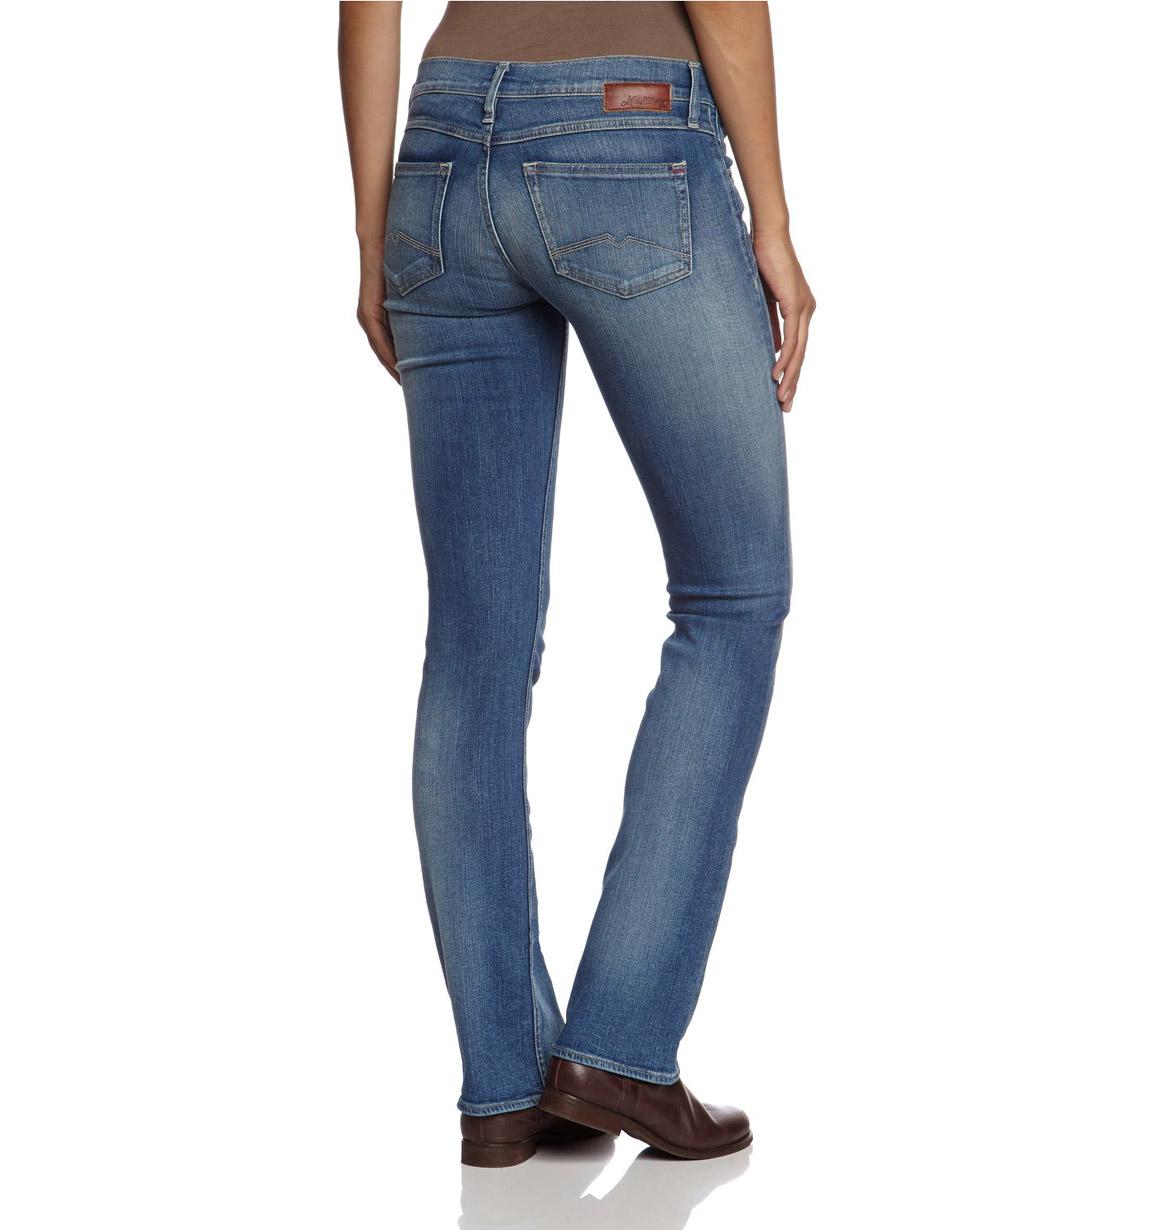 Mustang Jeans női farmernadrág Girls Oregon 3580-5039-512 mustang shoes d7e837df69